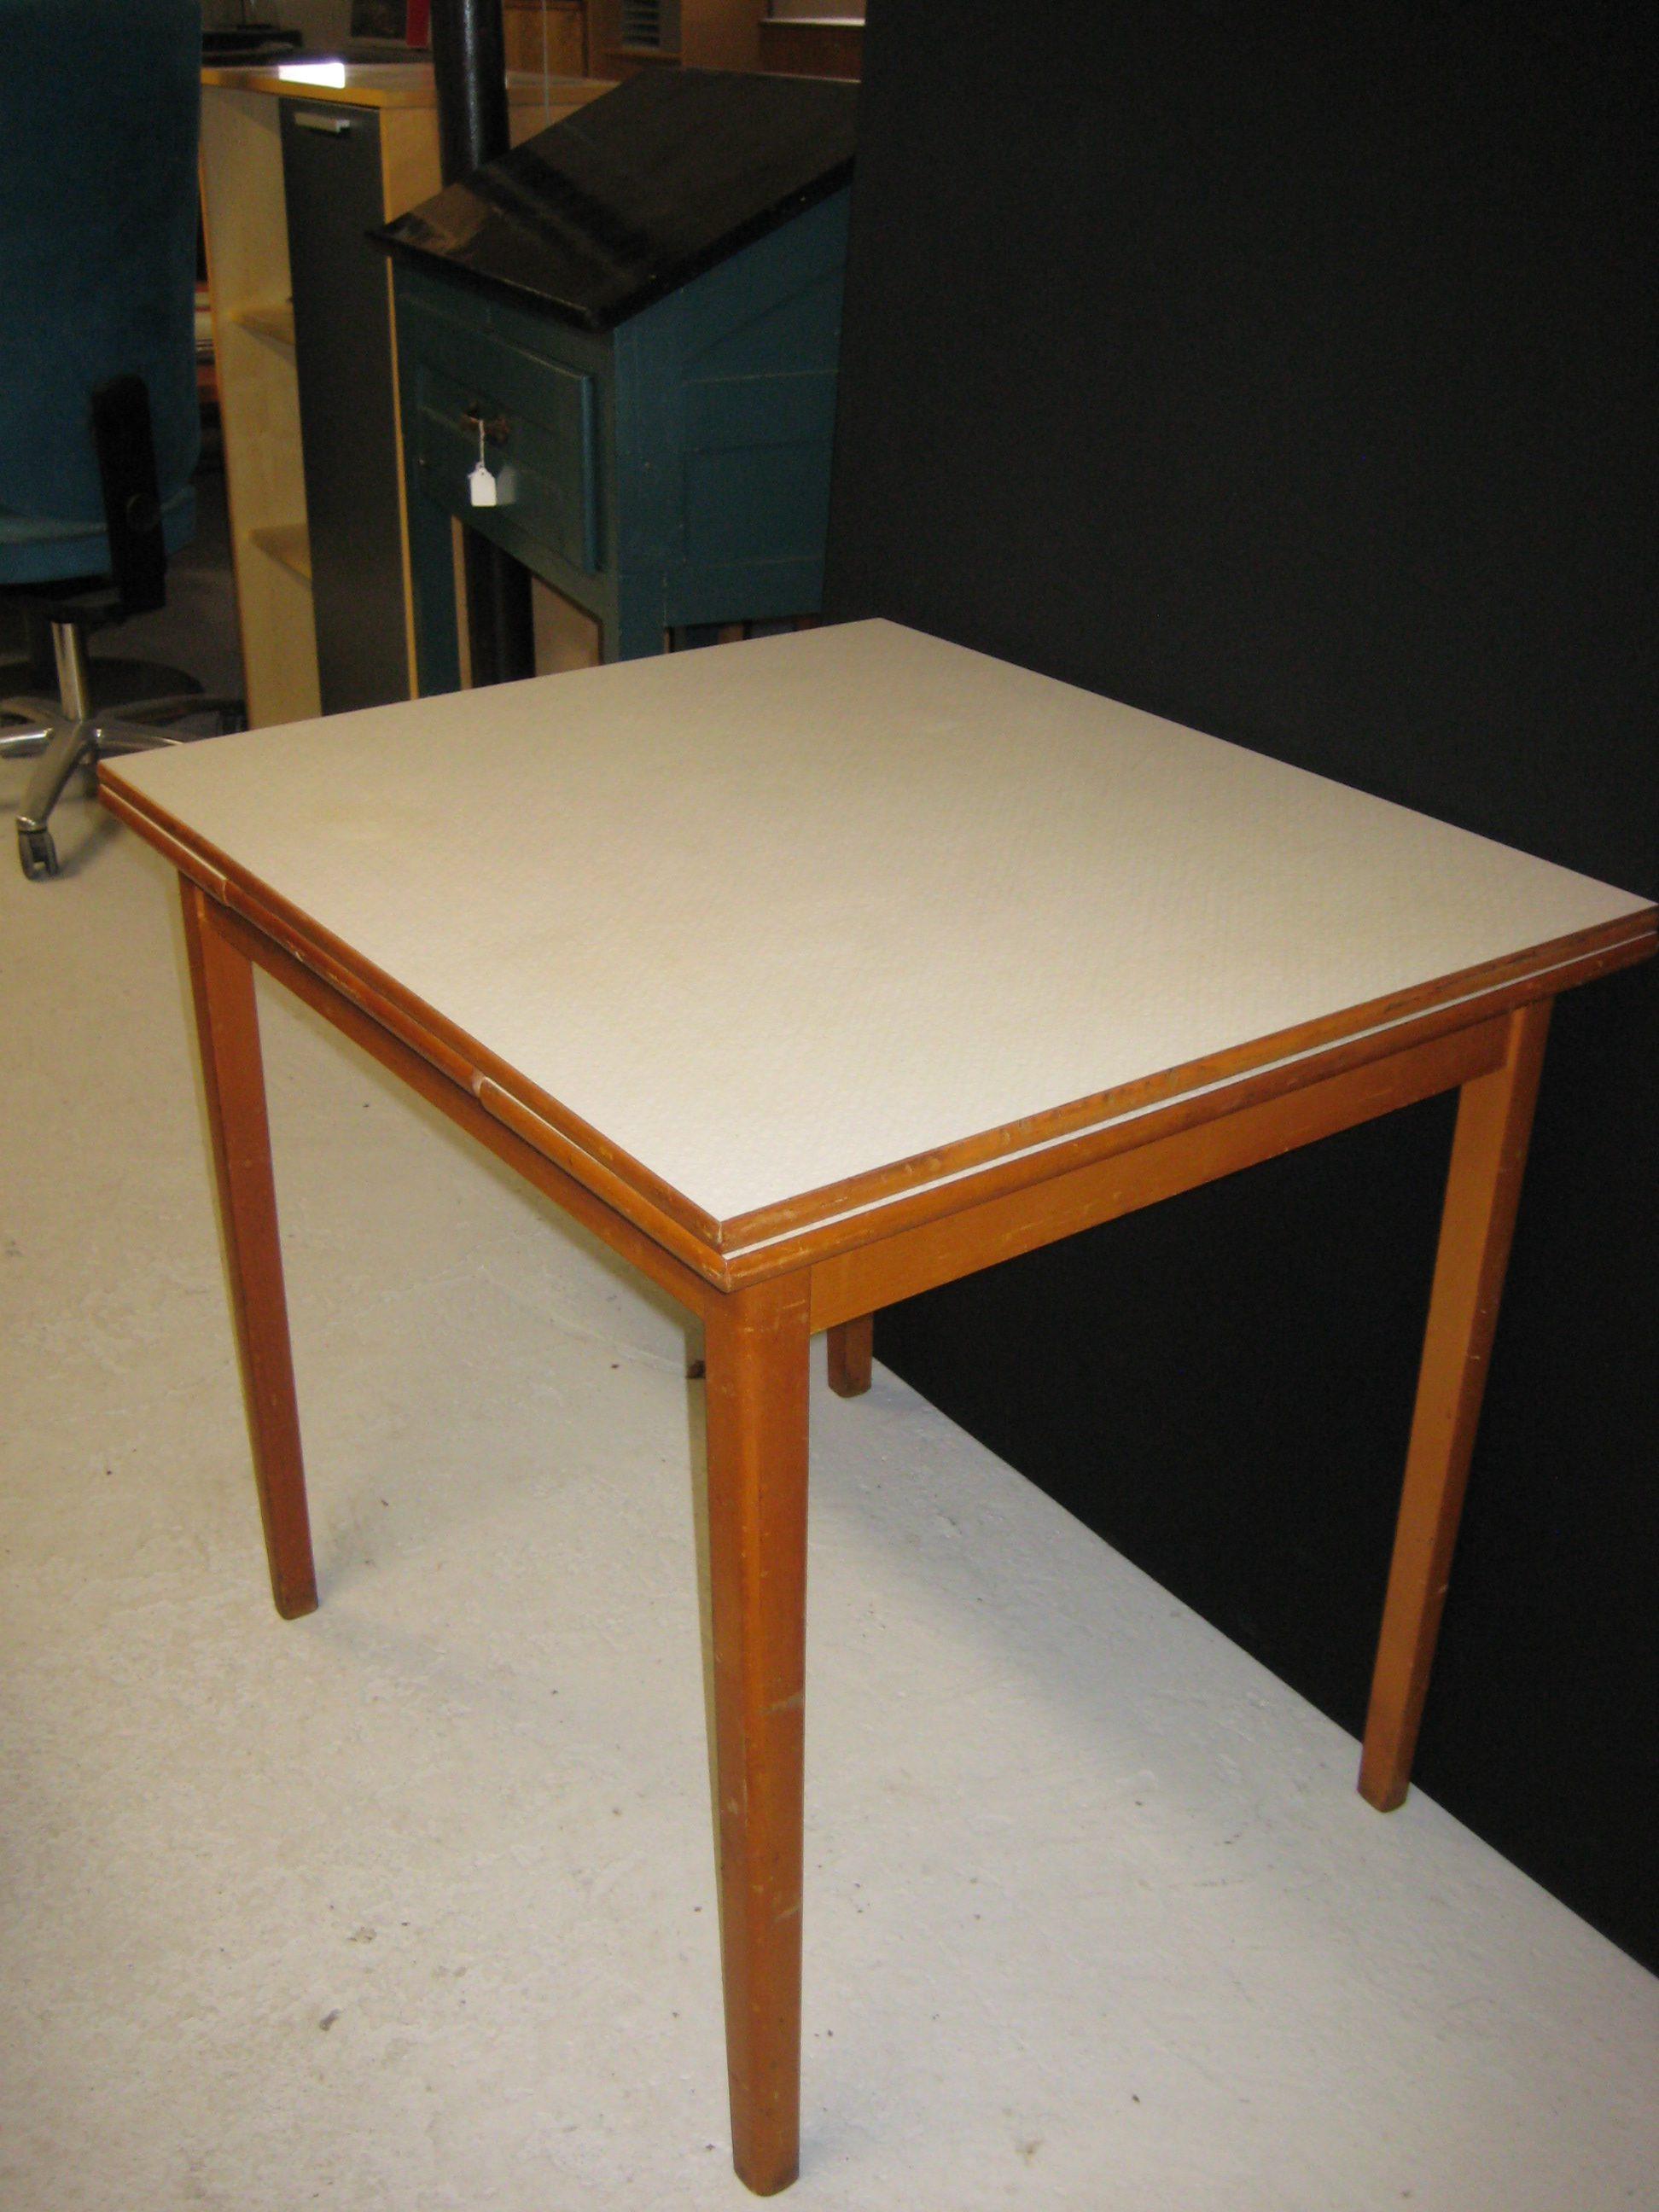 Køkkenbord med laminatplade